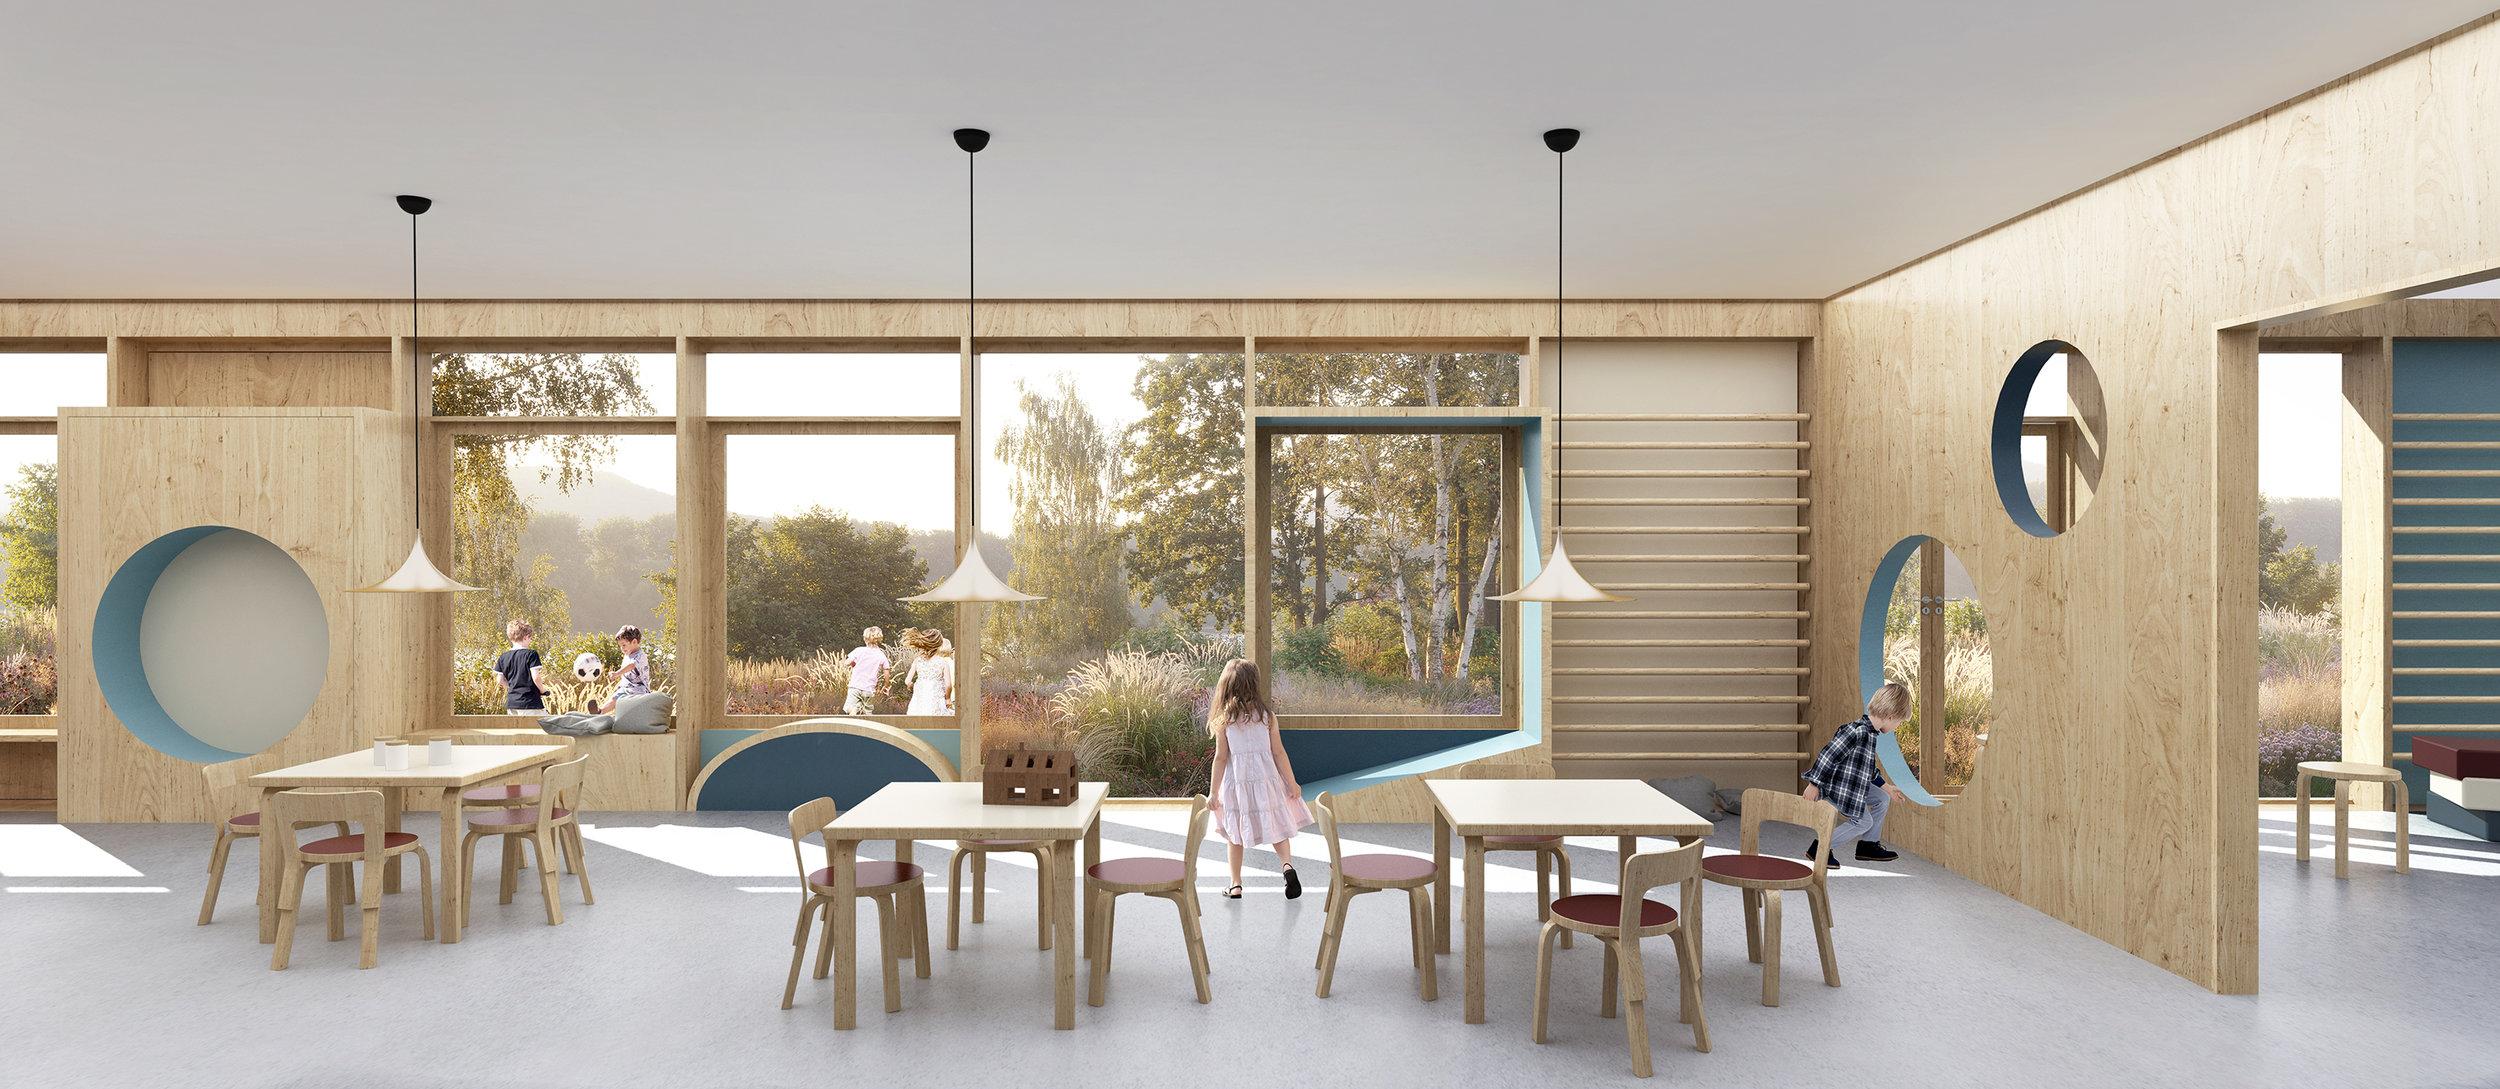 Kindergarten interior.jpg